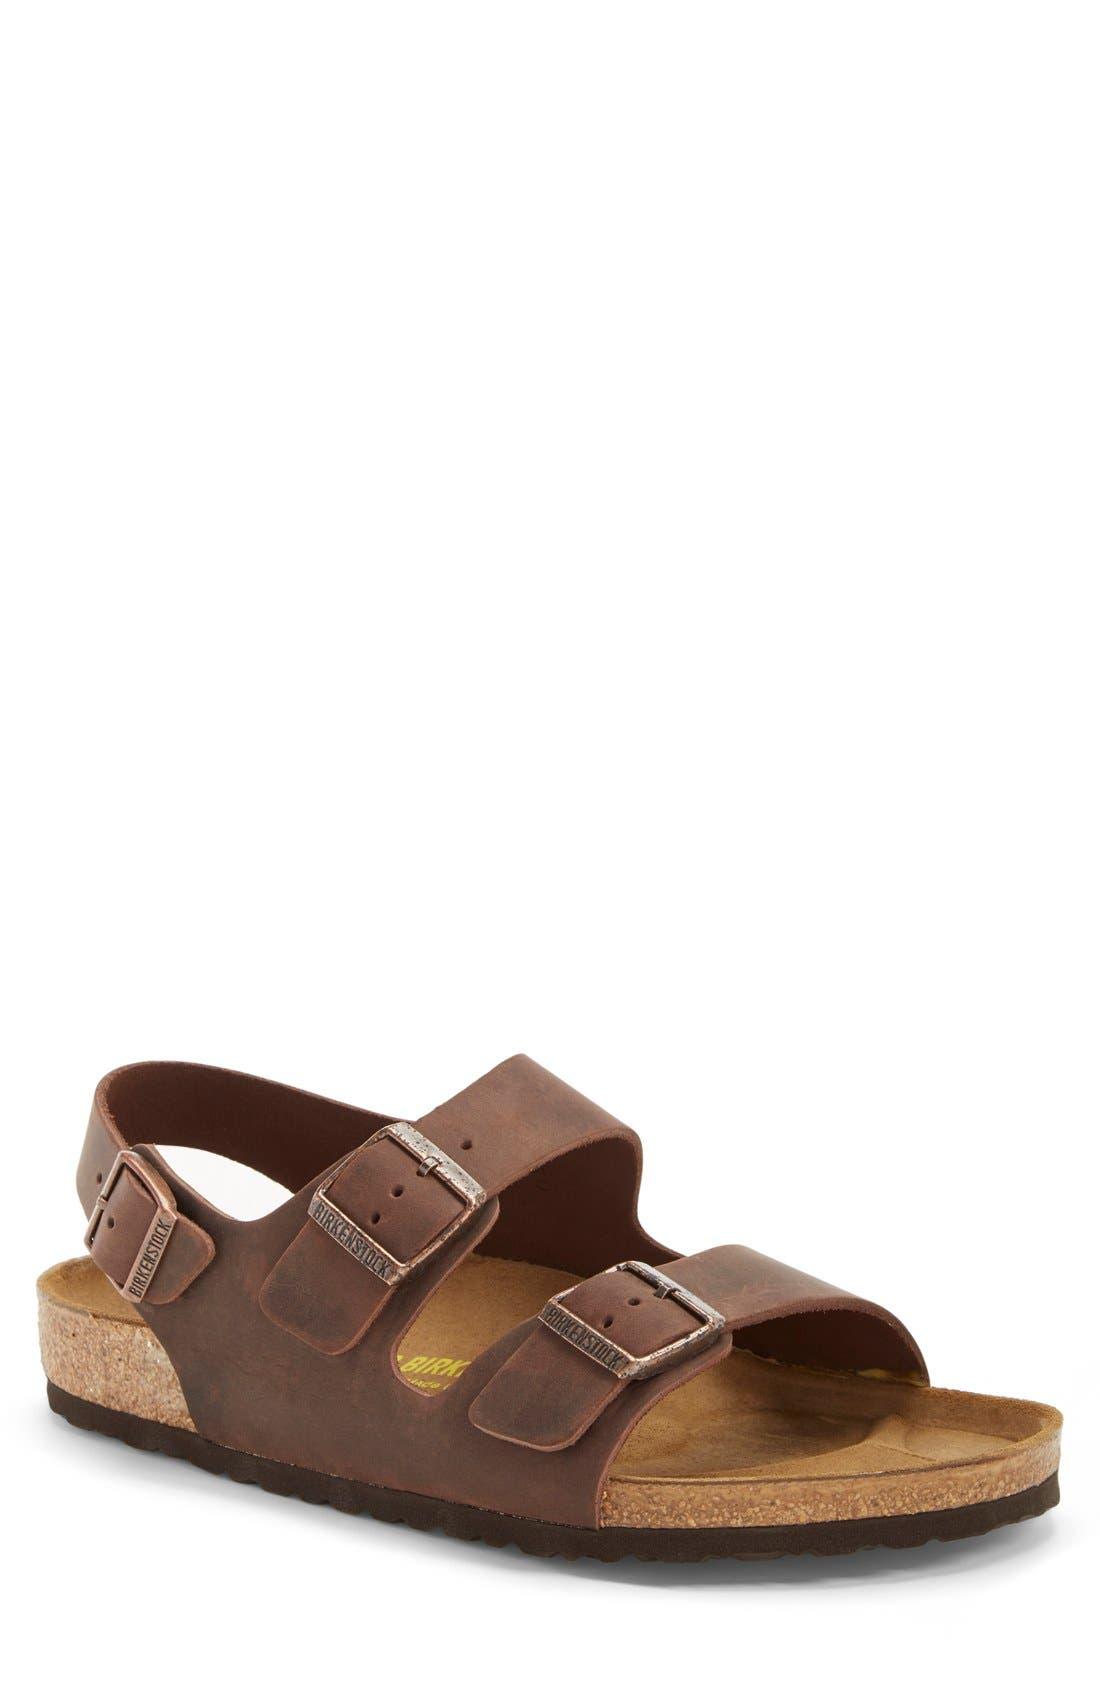 Main Image - Birkenstock 'Milano' Sandal   (Men)